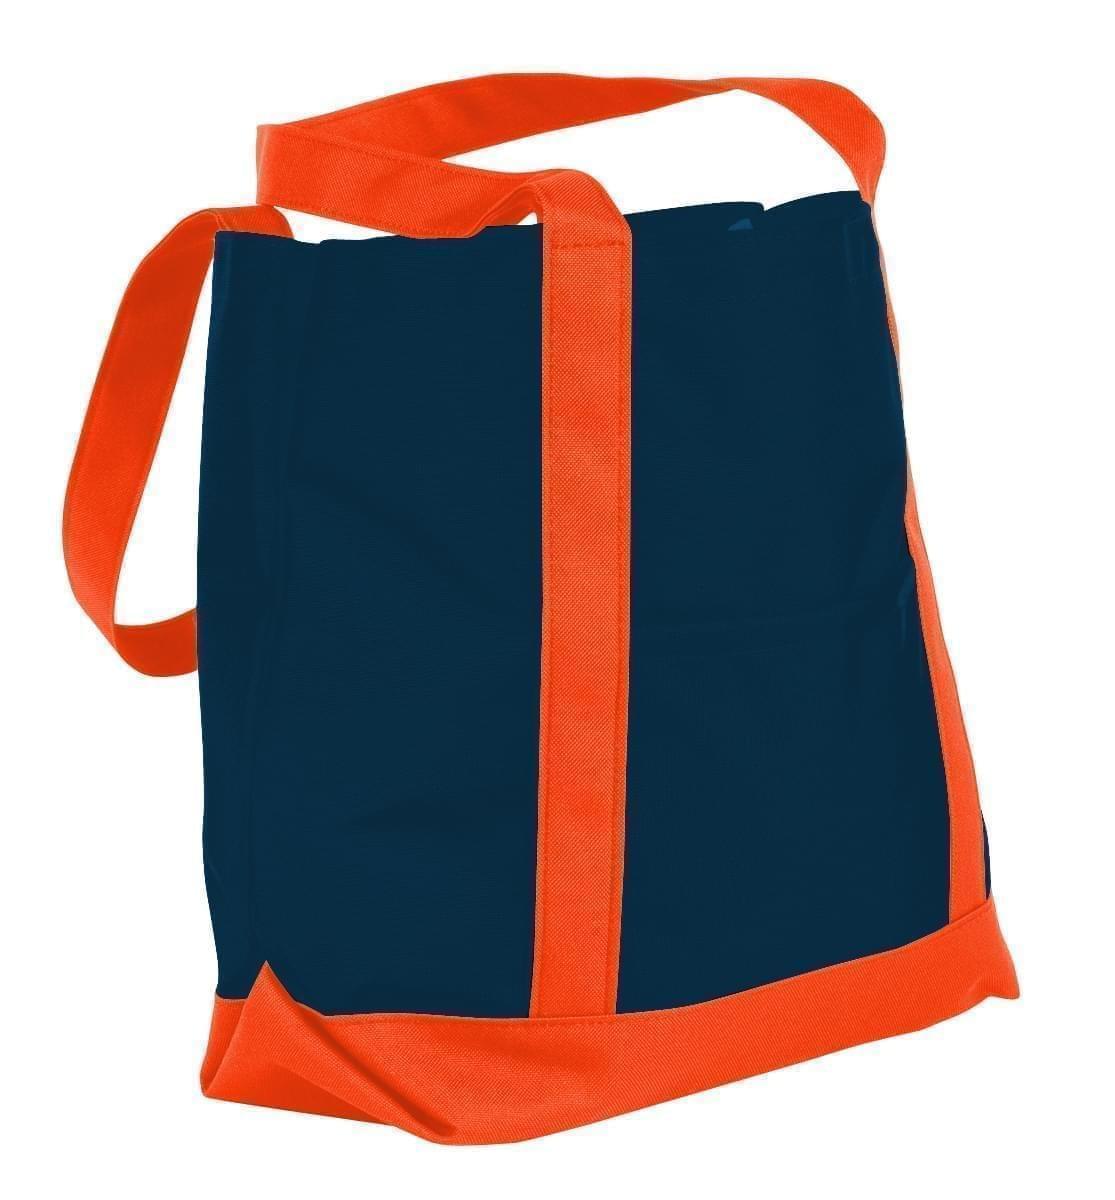 USA Made Canvas Fashion Tote Bags, Navy-Orange, XAACL1UACJ